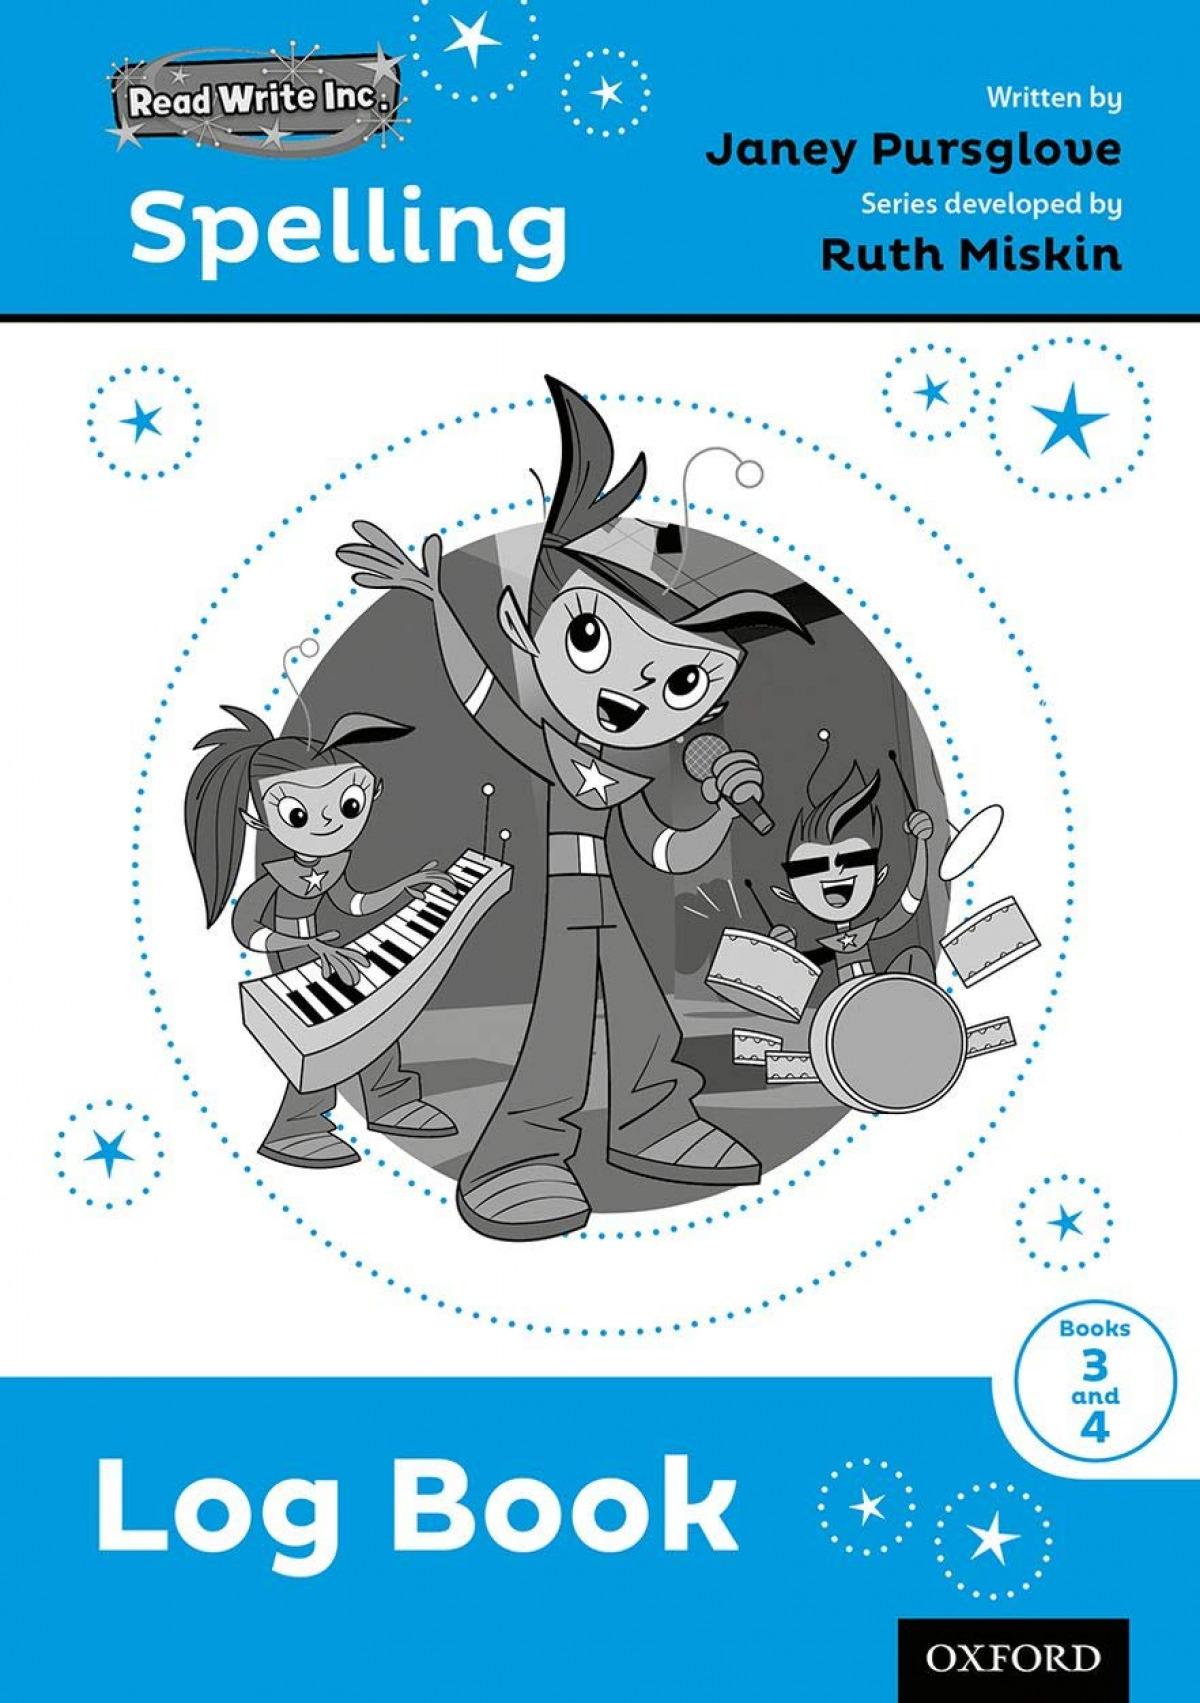 READ WRITE INC SPELLING LOG BOOK 3-4